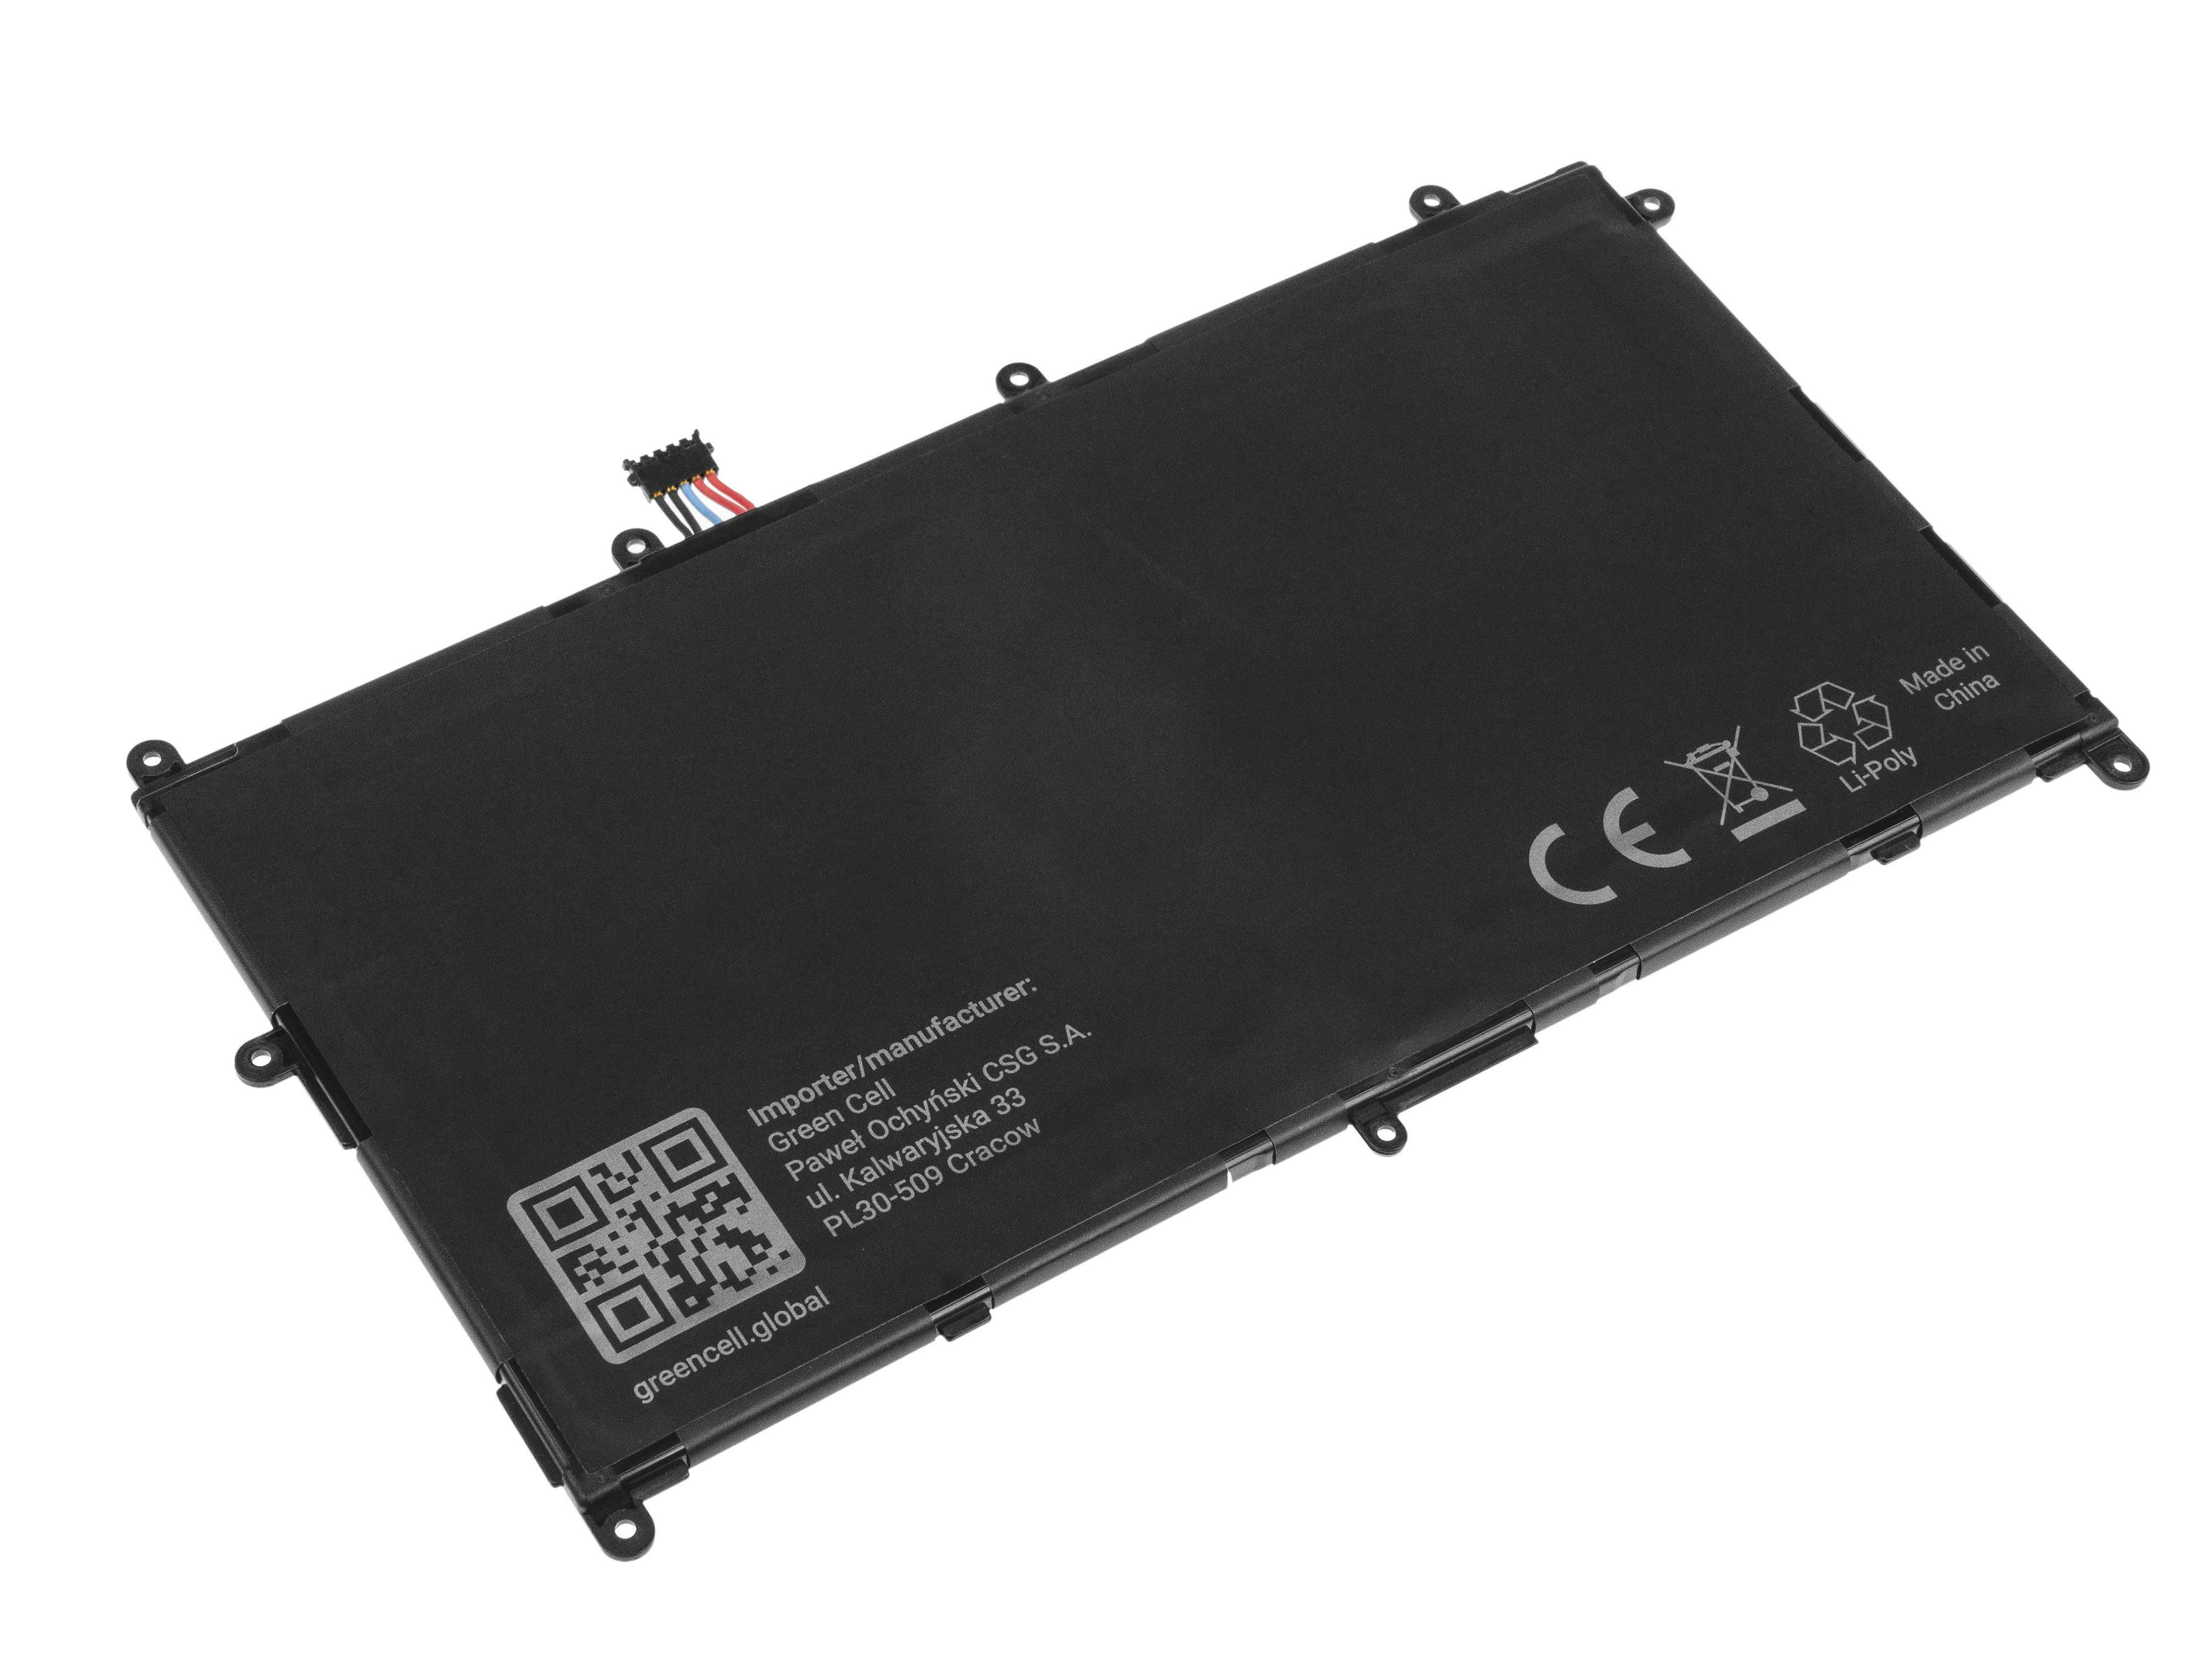 Green Cell TAB26 Baterie Samsung SP368487A(1S2P) pro Samsung Galaxy Tab 8.9 P7300 P7310 P7320 6100mAh Li-Pol – neoriginální